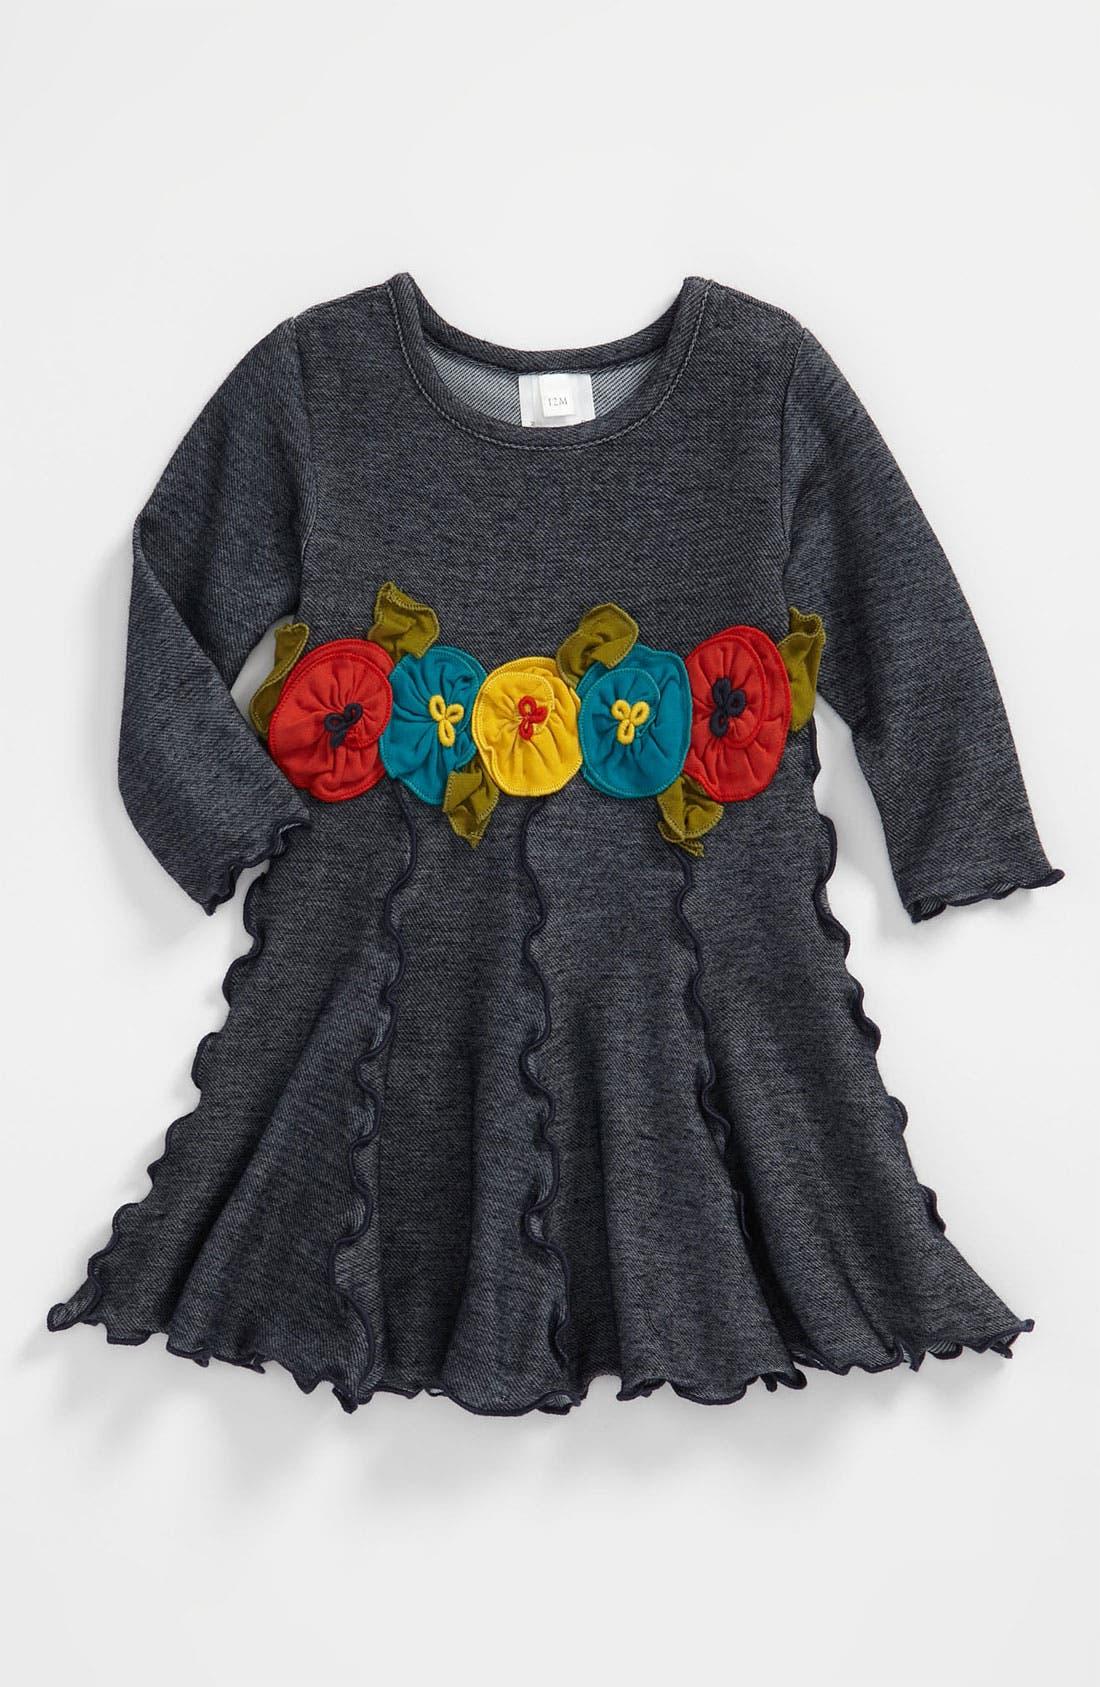 Main Image - Love U Lots Ruffle Trimmed Dress (Toddler)